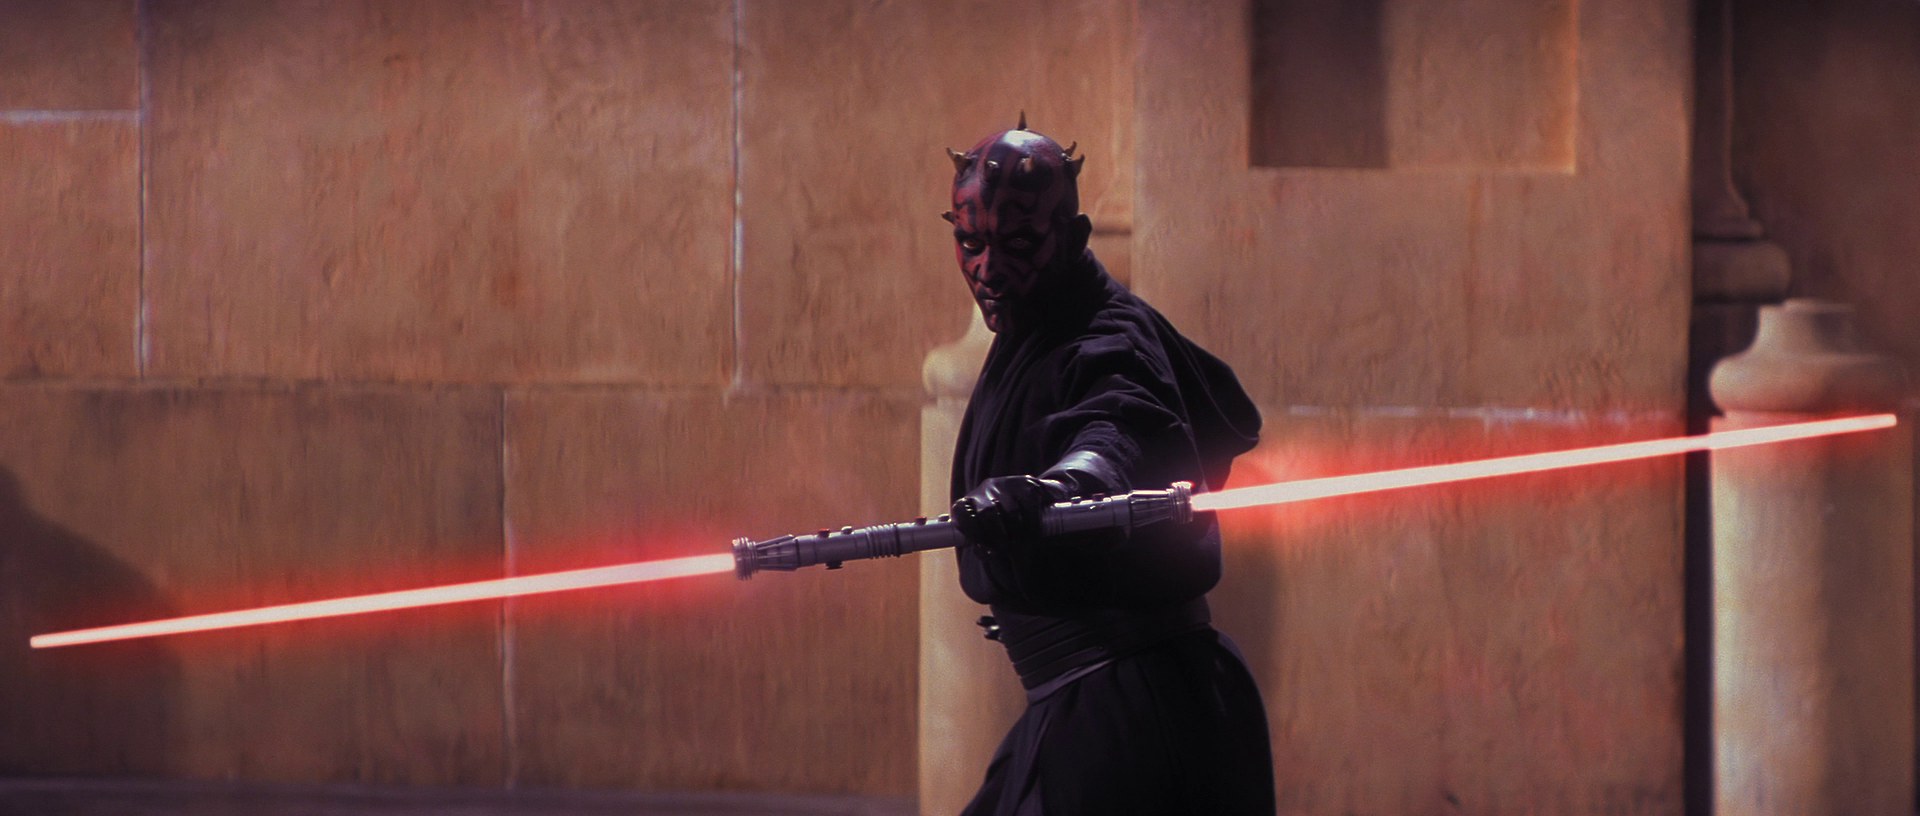 Darth Maul lightsaber reveal